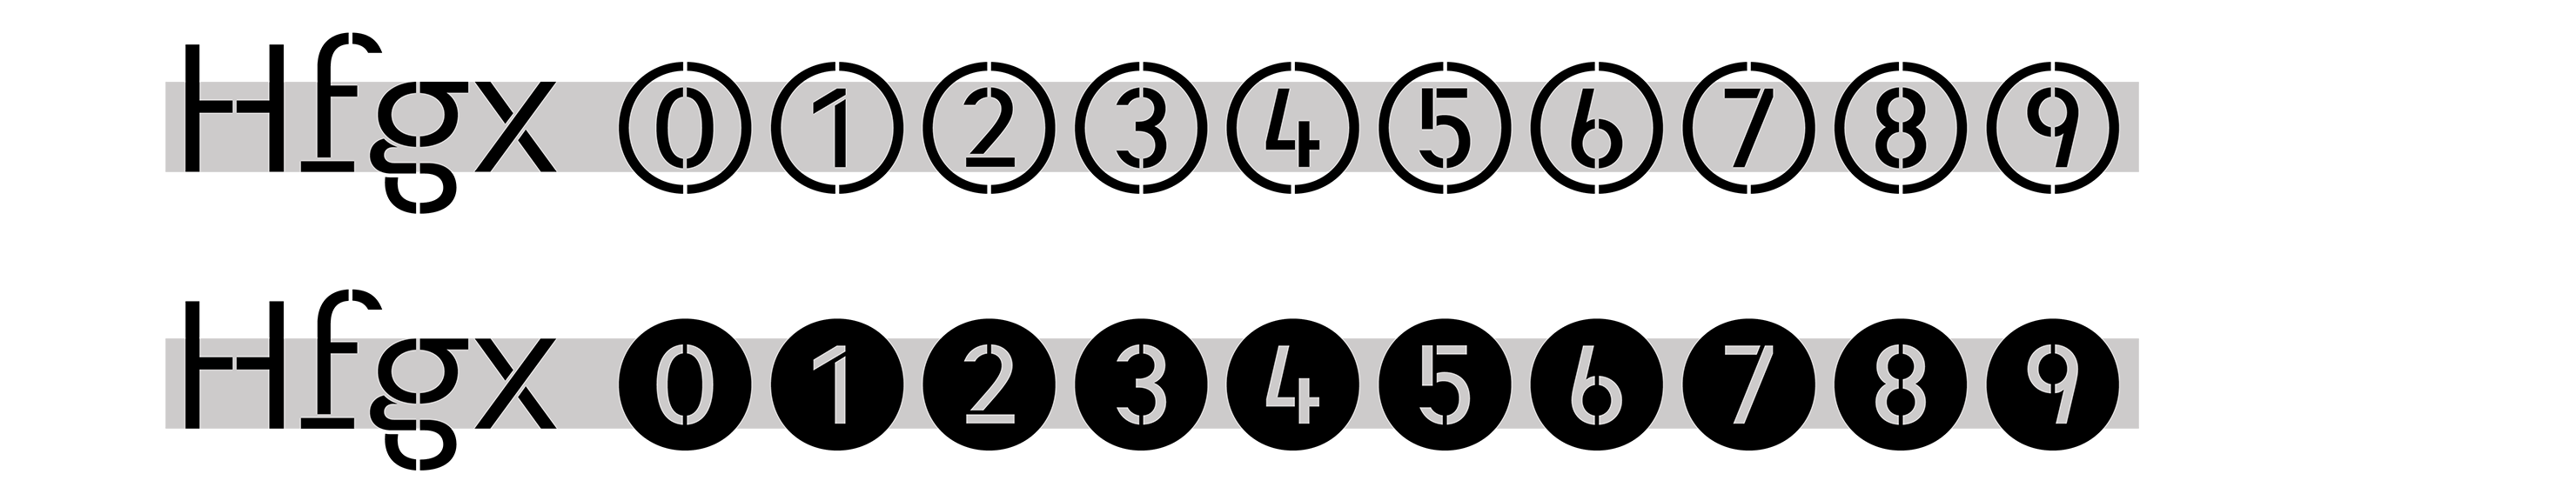 Typeface-Heimat-Stencil-F17-Atlas-Font-Foundry